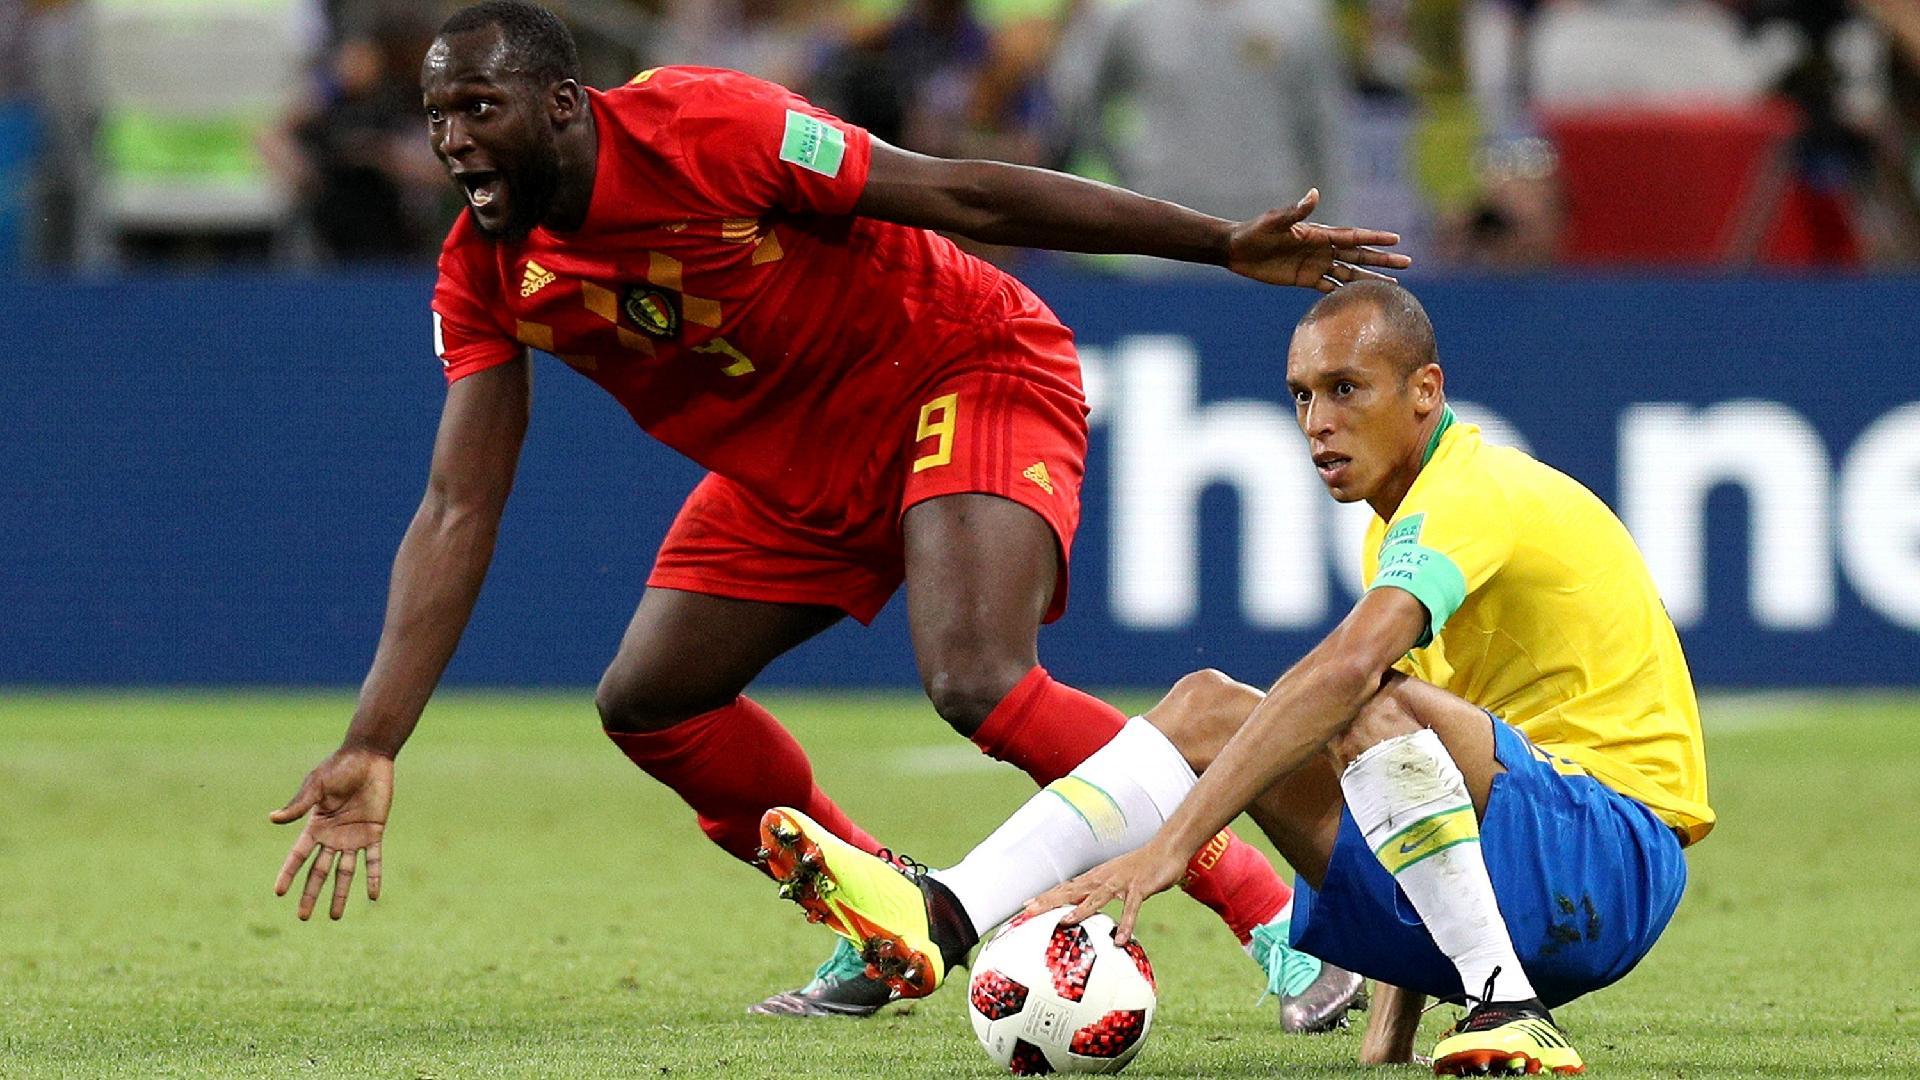 Bélgica Brasil Lukaku Miranda disputa reclama